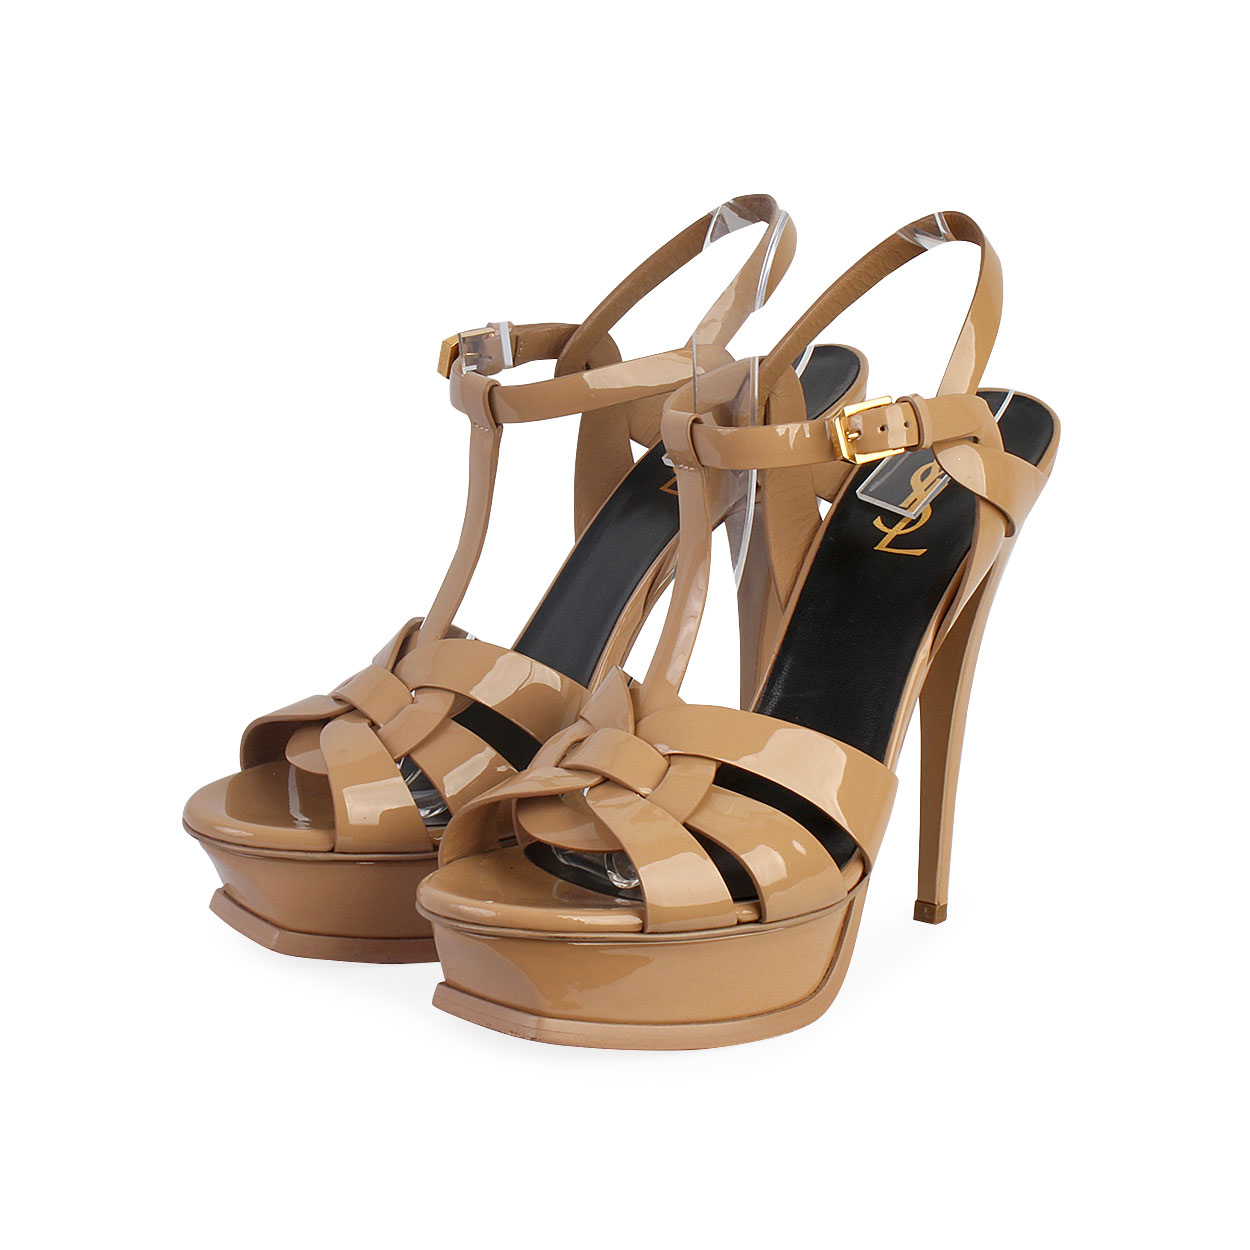 Yves Saint Laurent Nude Patent Leather Bali Flat Sandals